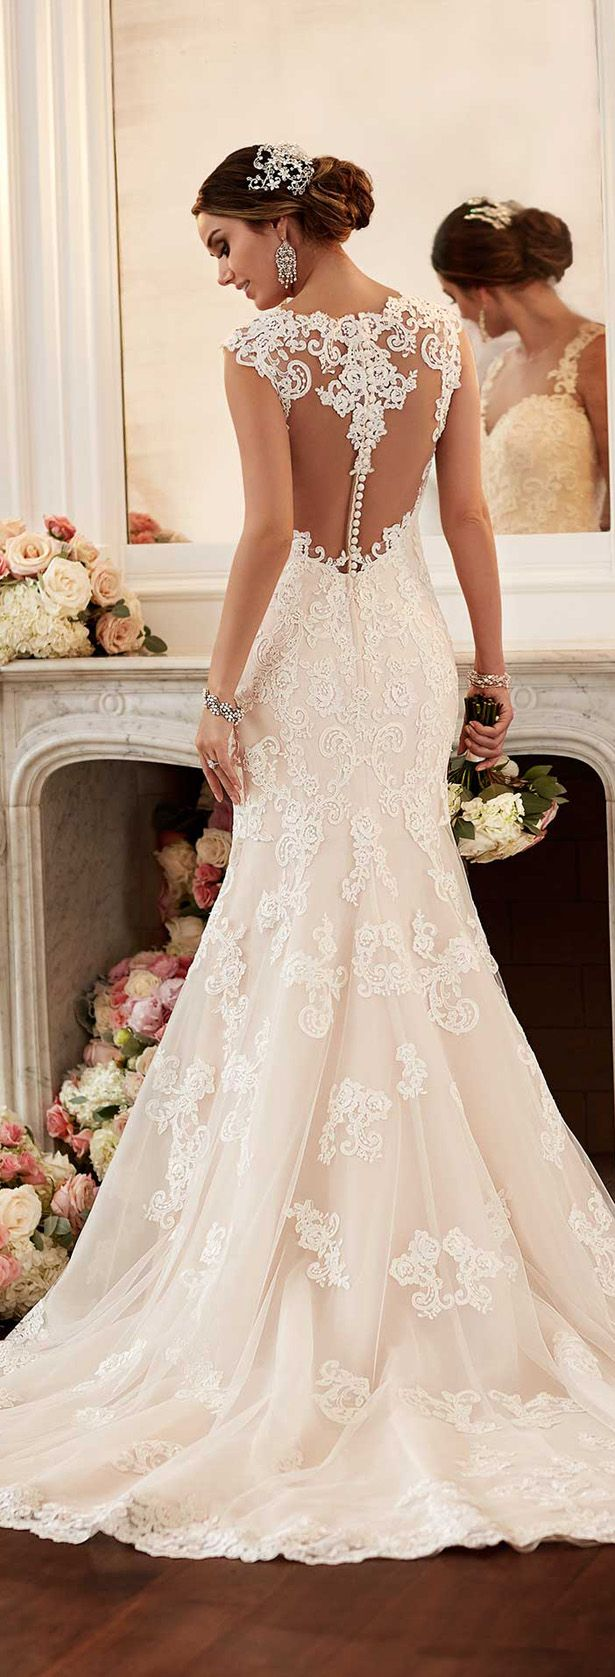 dresses best wedding dress Wedding Dress by Stella York Spring